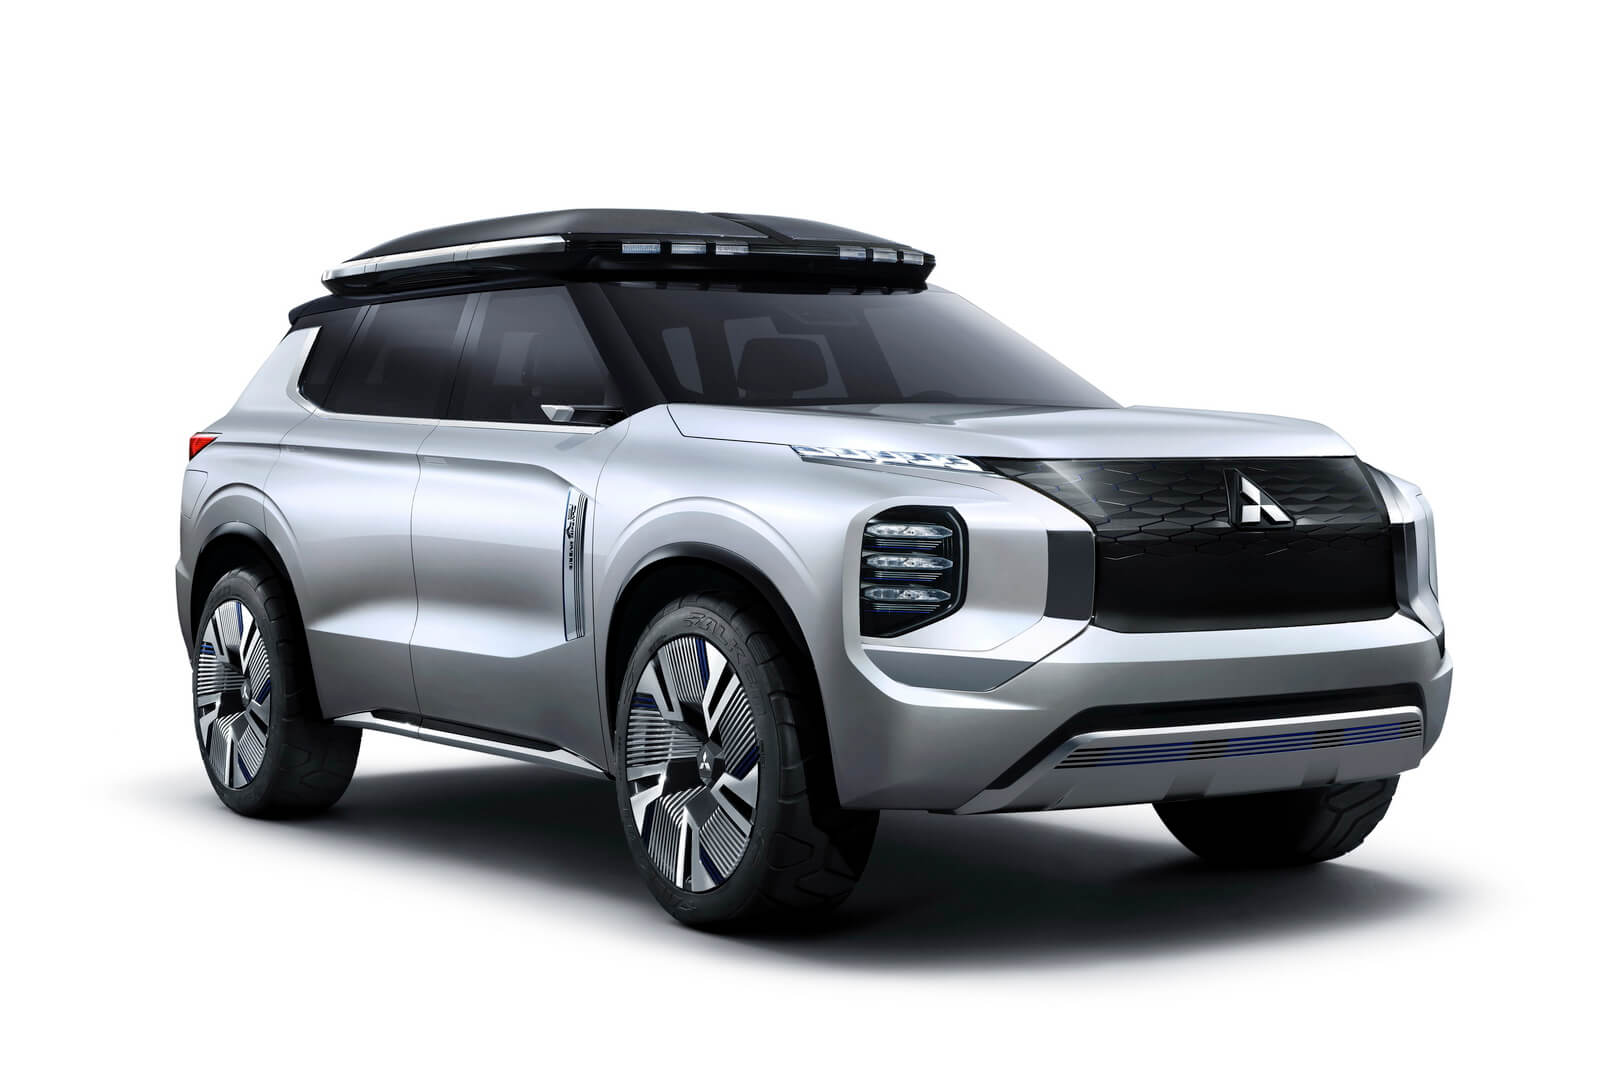 Плагин-гибрид Mitsubishi Engelberg Tourer PHEV